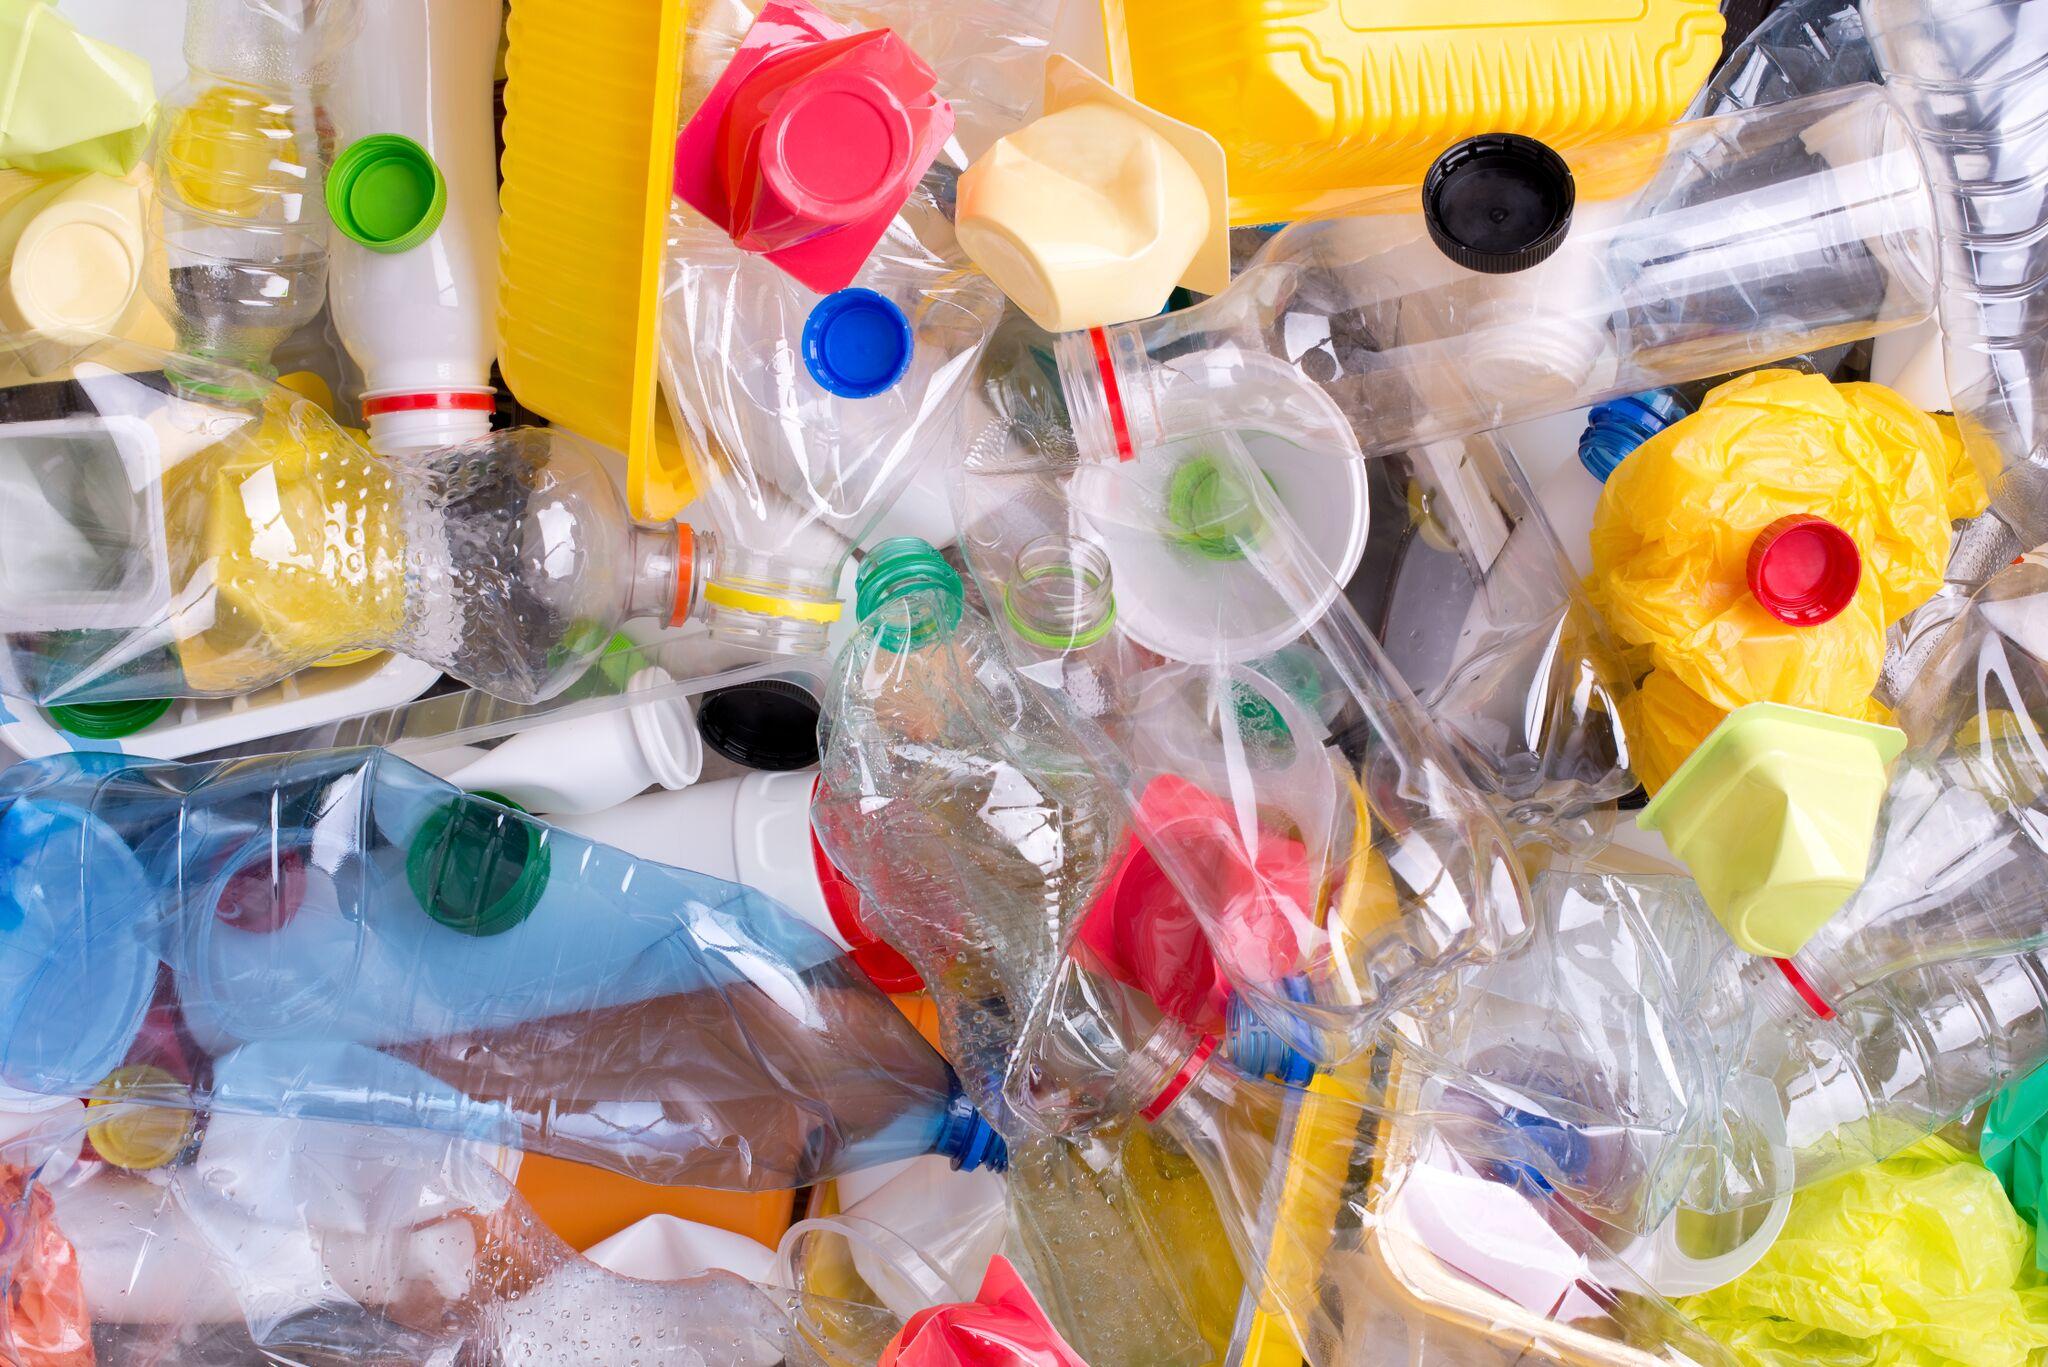 Rene plastflasker og -beholdere i mange farger